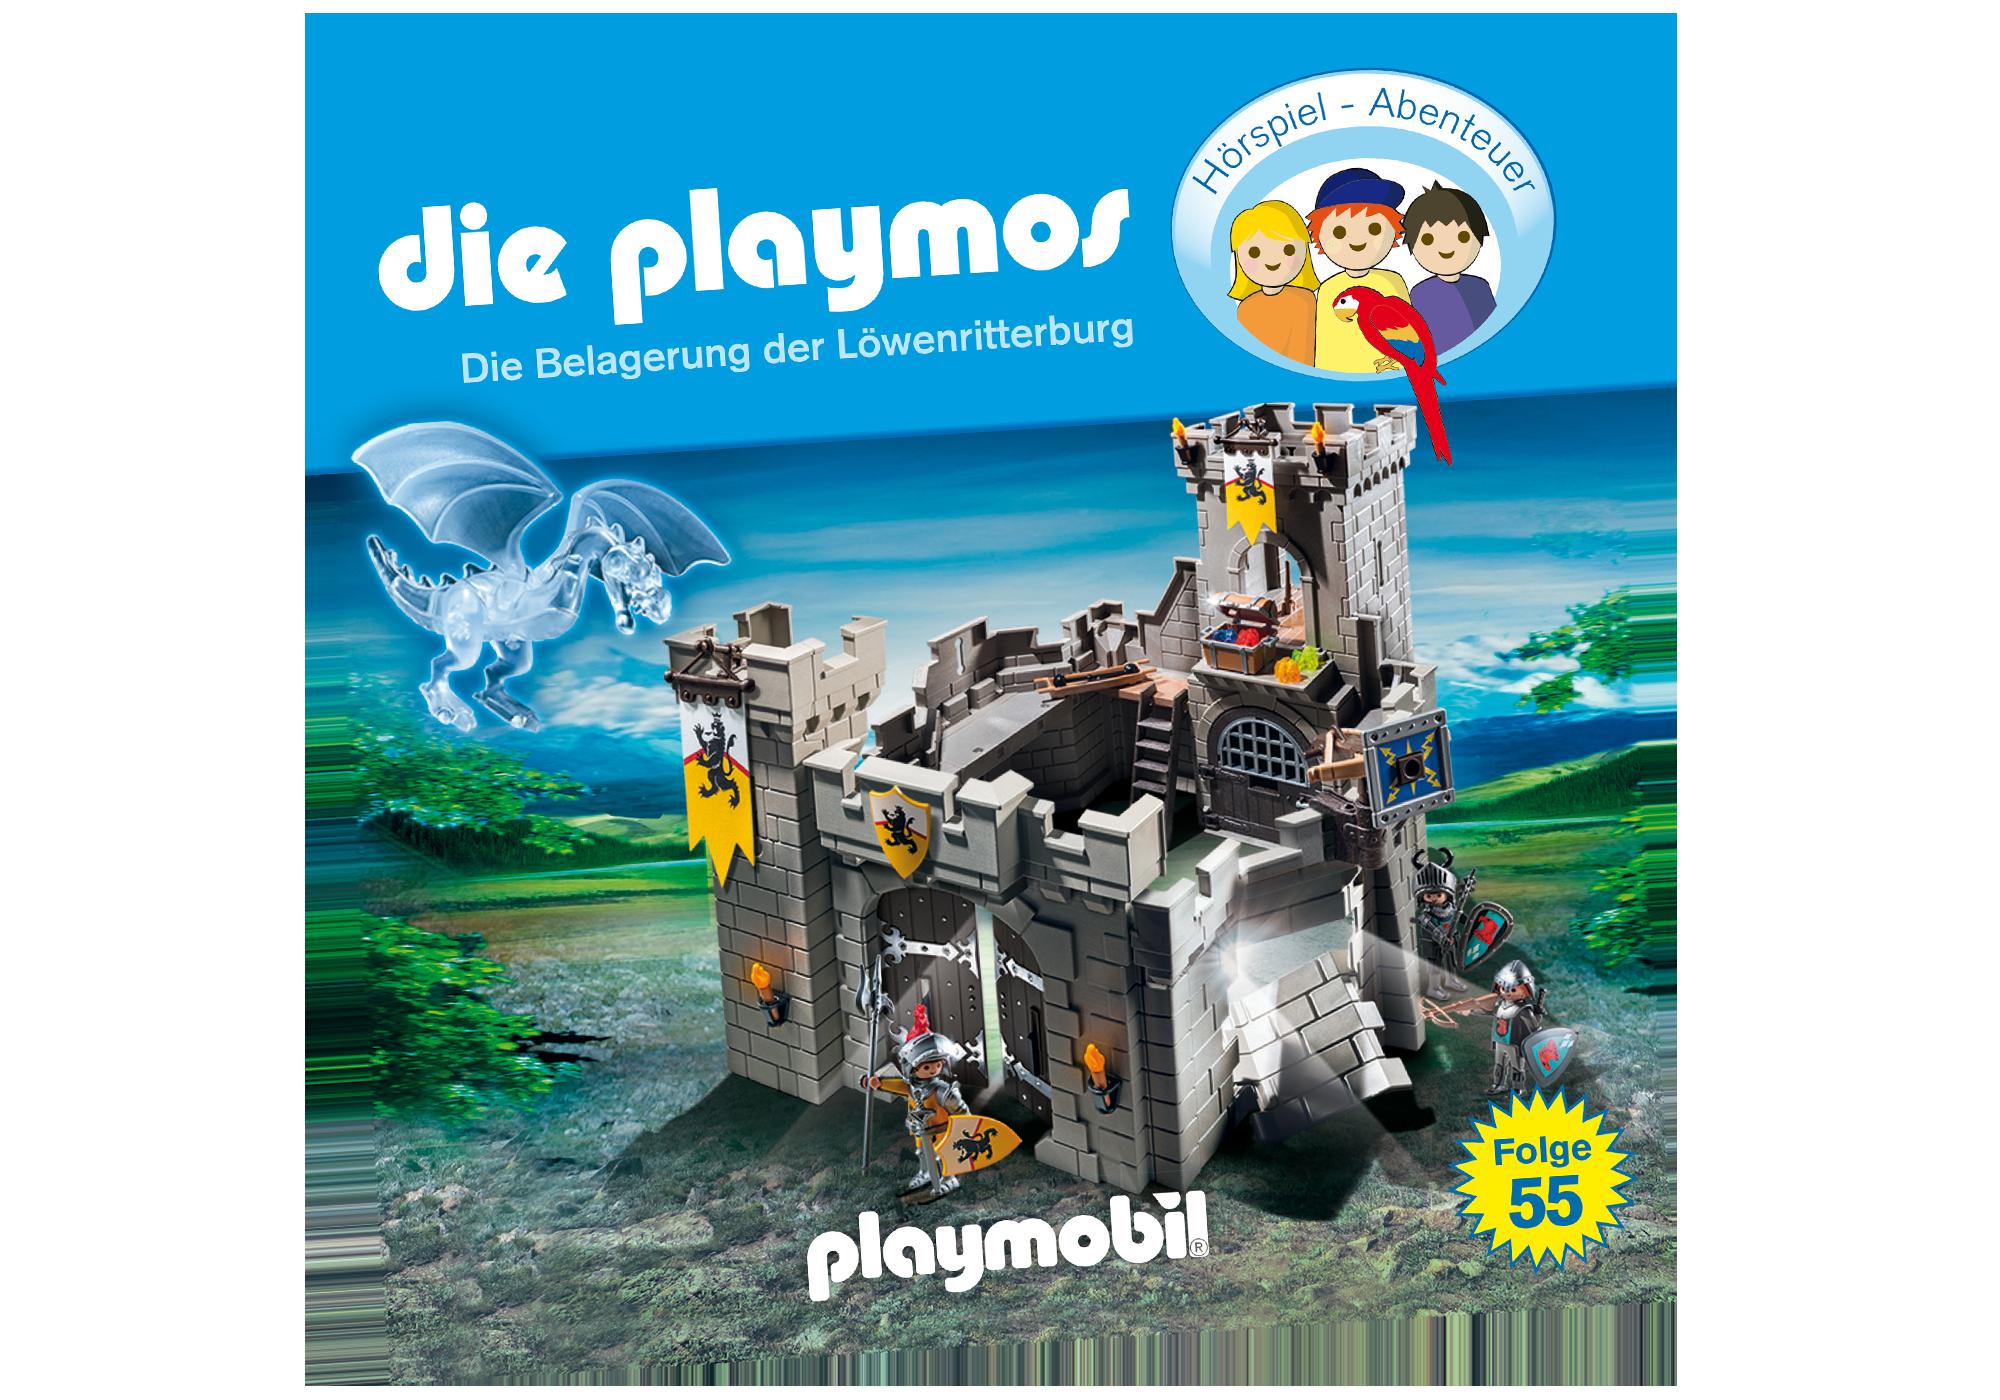 http://media.playmobil.com/i/playmobil/80484_product_detail/Belagerung der Löwenritterburg - Folge 55